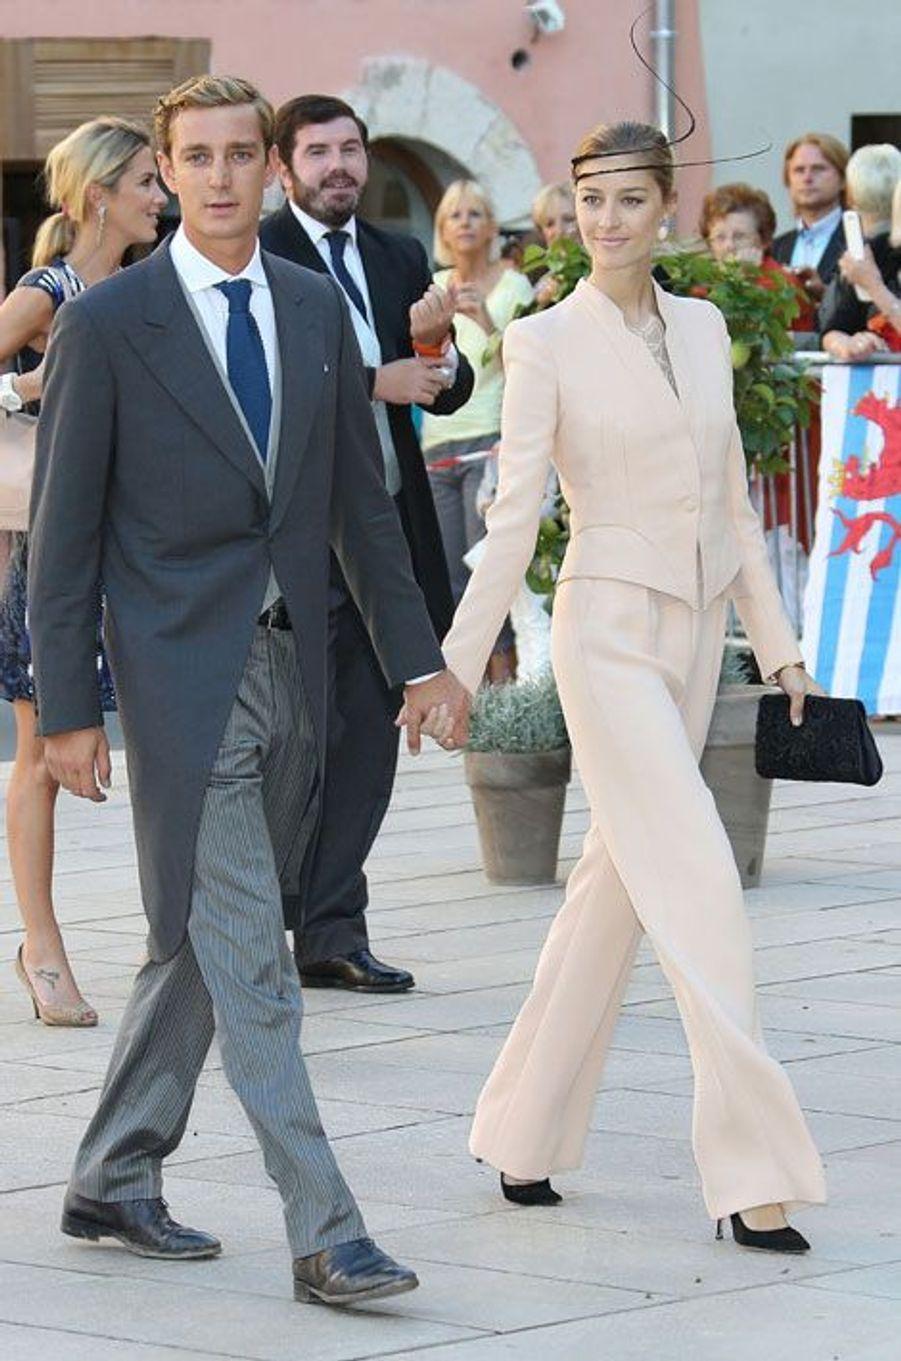 Pierre Casiraghi et Beatrice, duo complice